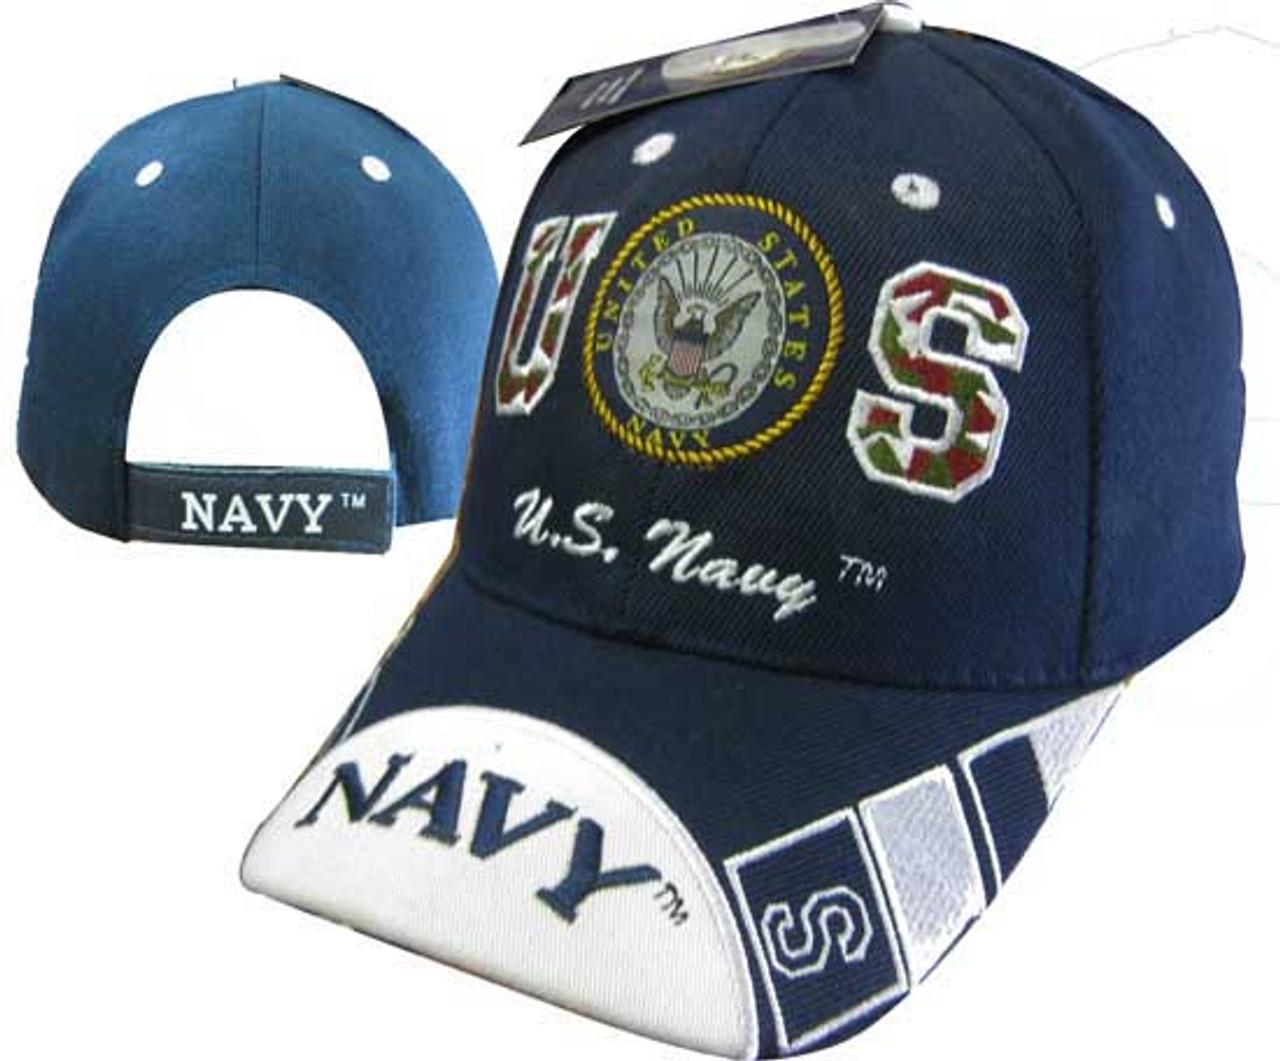 ... australia u.s. navy officially licensed with seal navy logo on bill baseball  cap hat 55cb5 989f0 d6901662efae